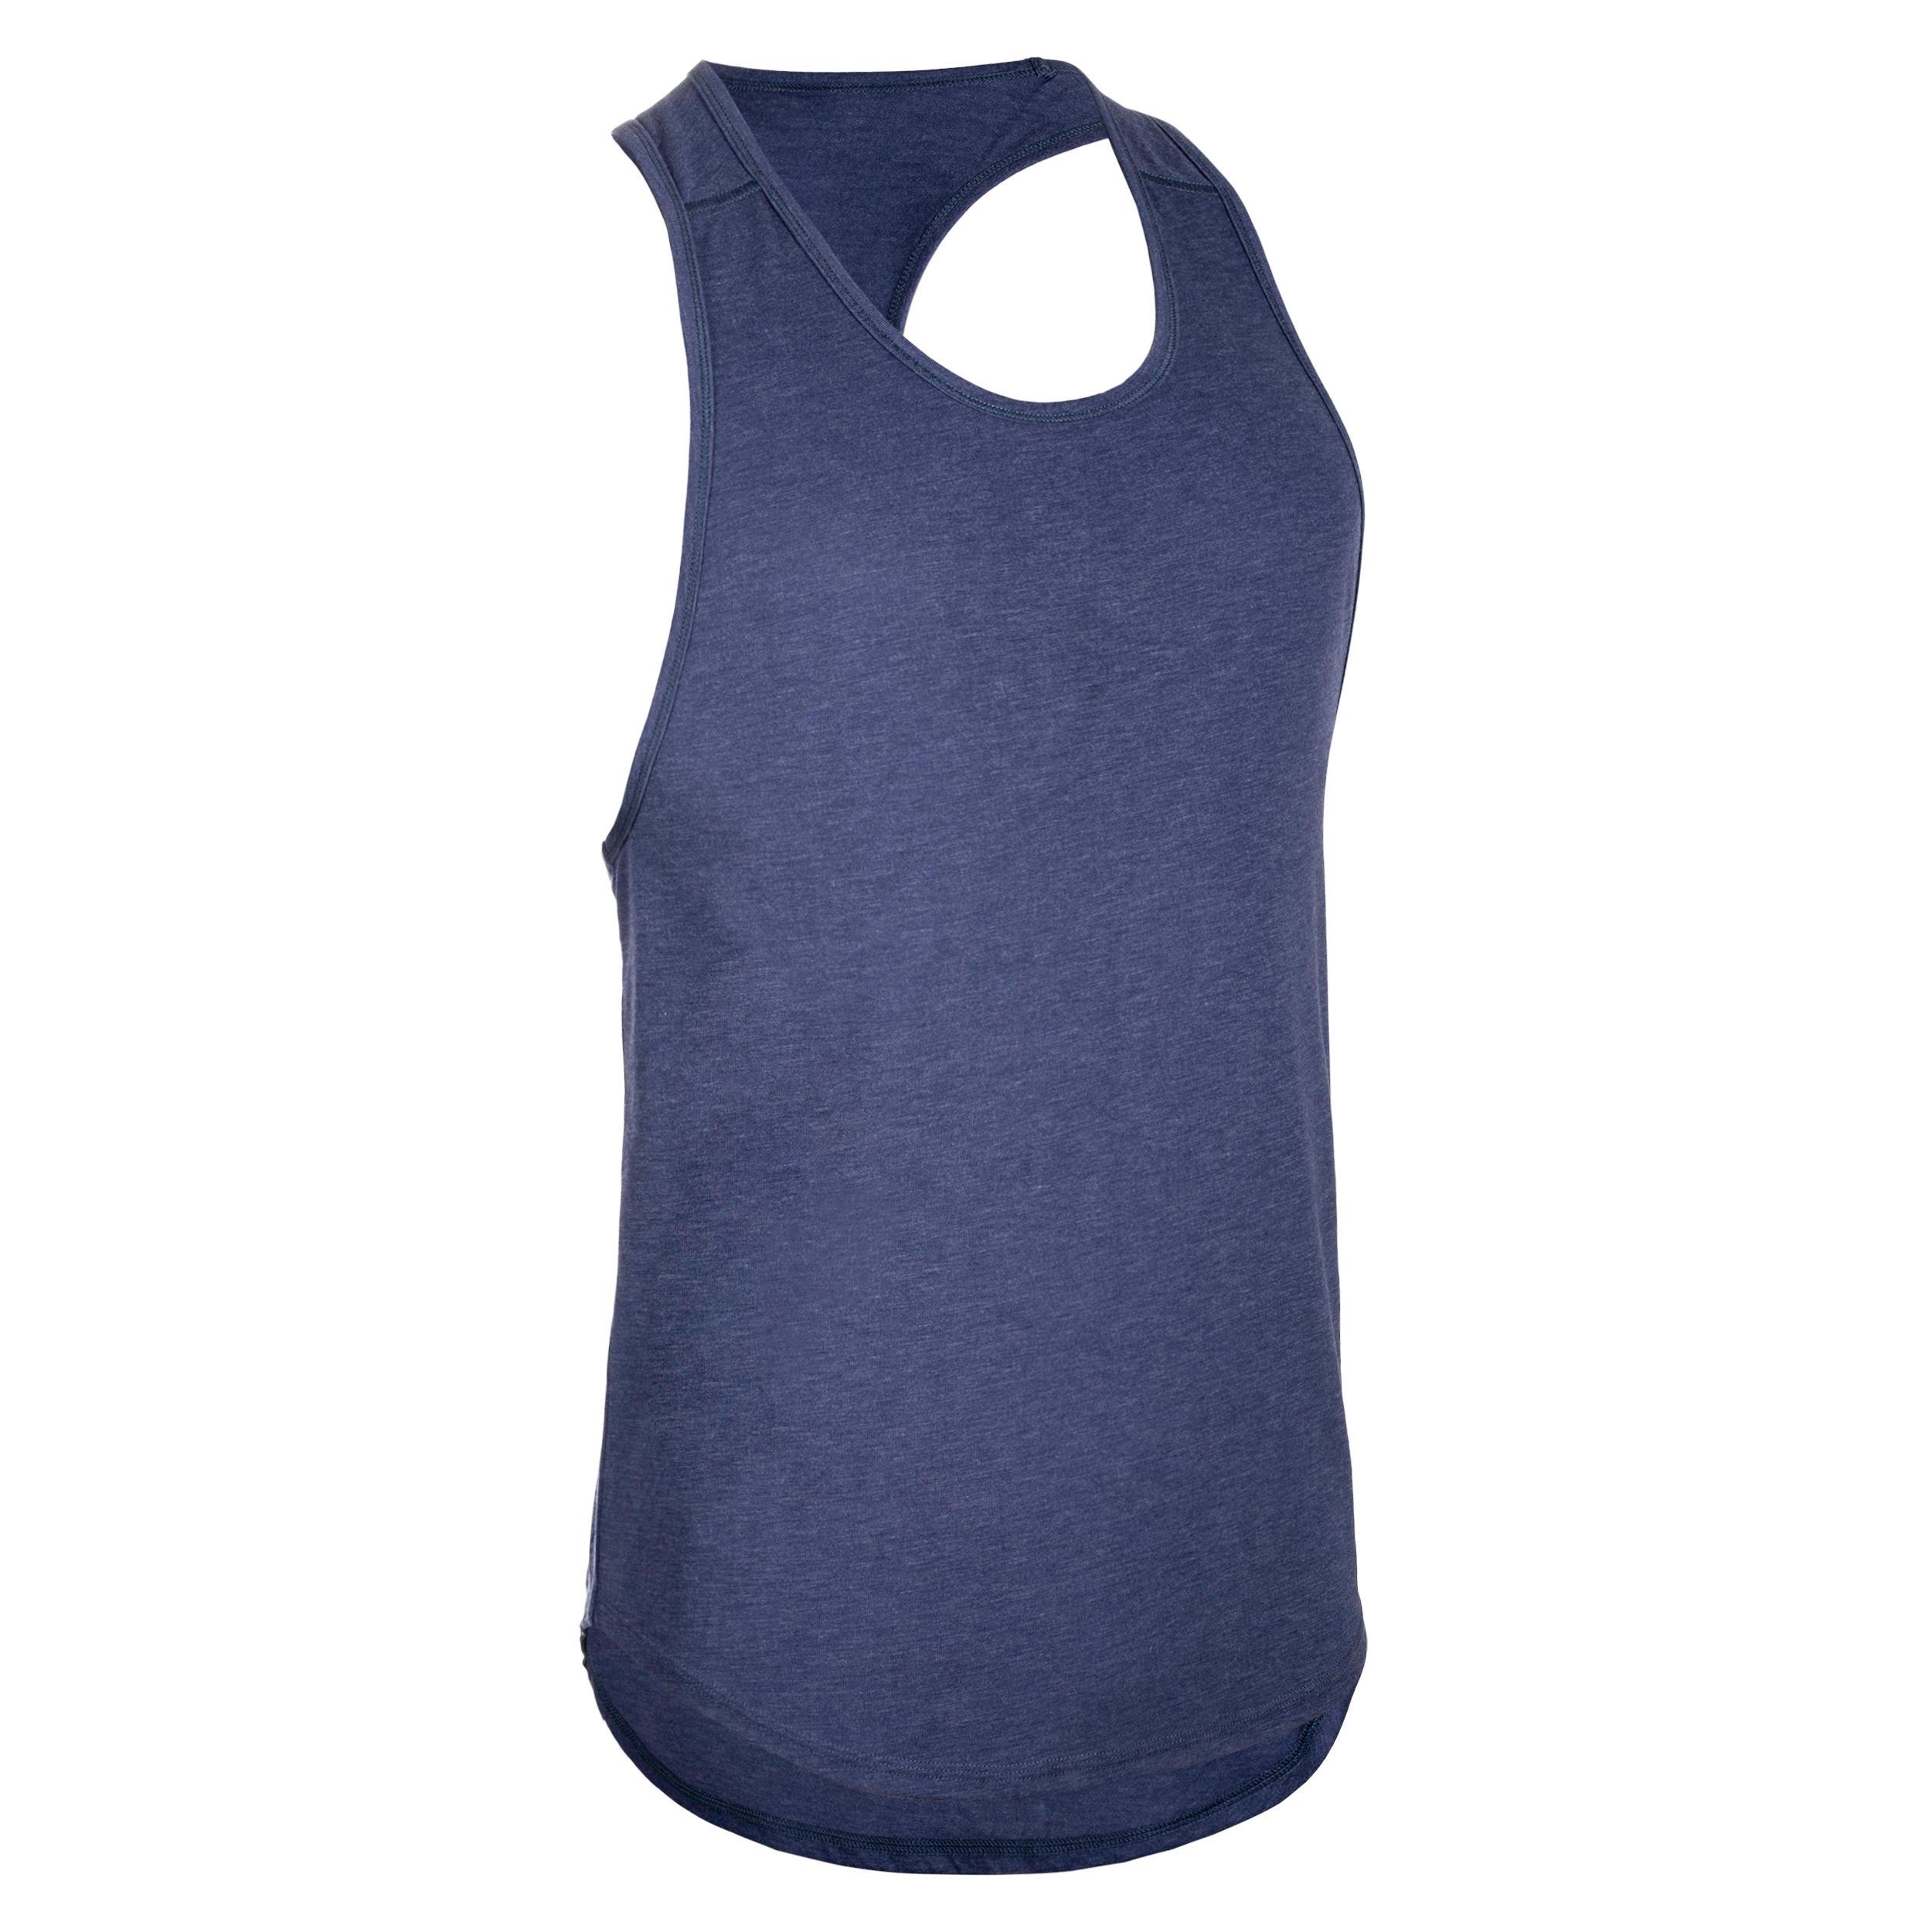 TCA Débardeur sans manches T-shirt bleu marine anti bactérienne Tissu Doux au toucher Gym Run